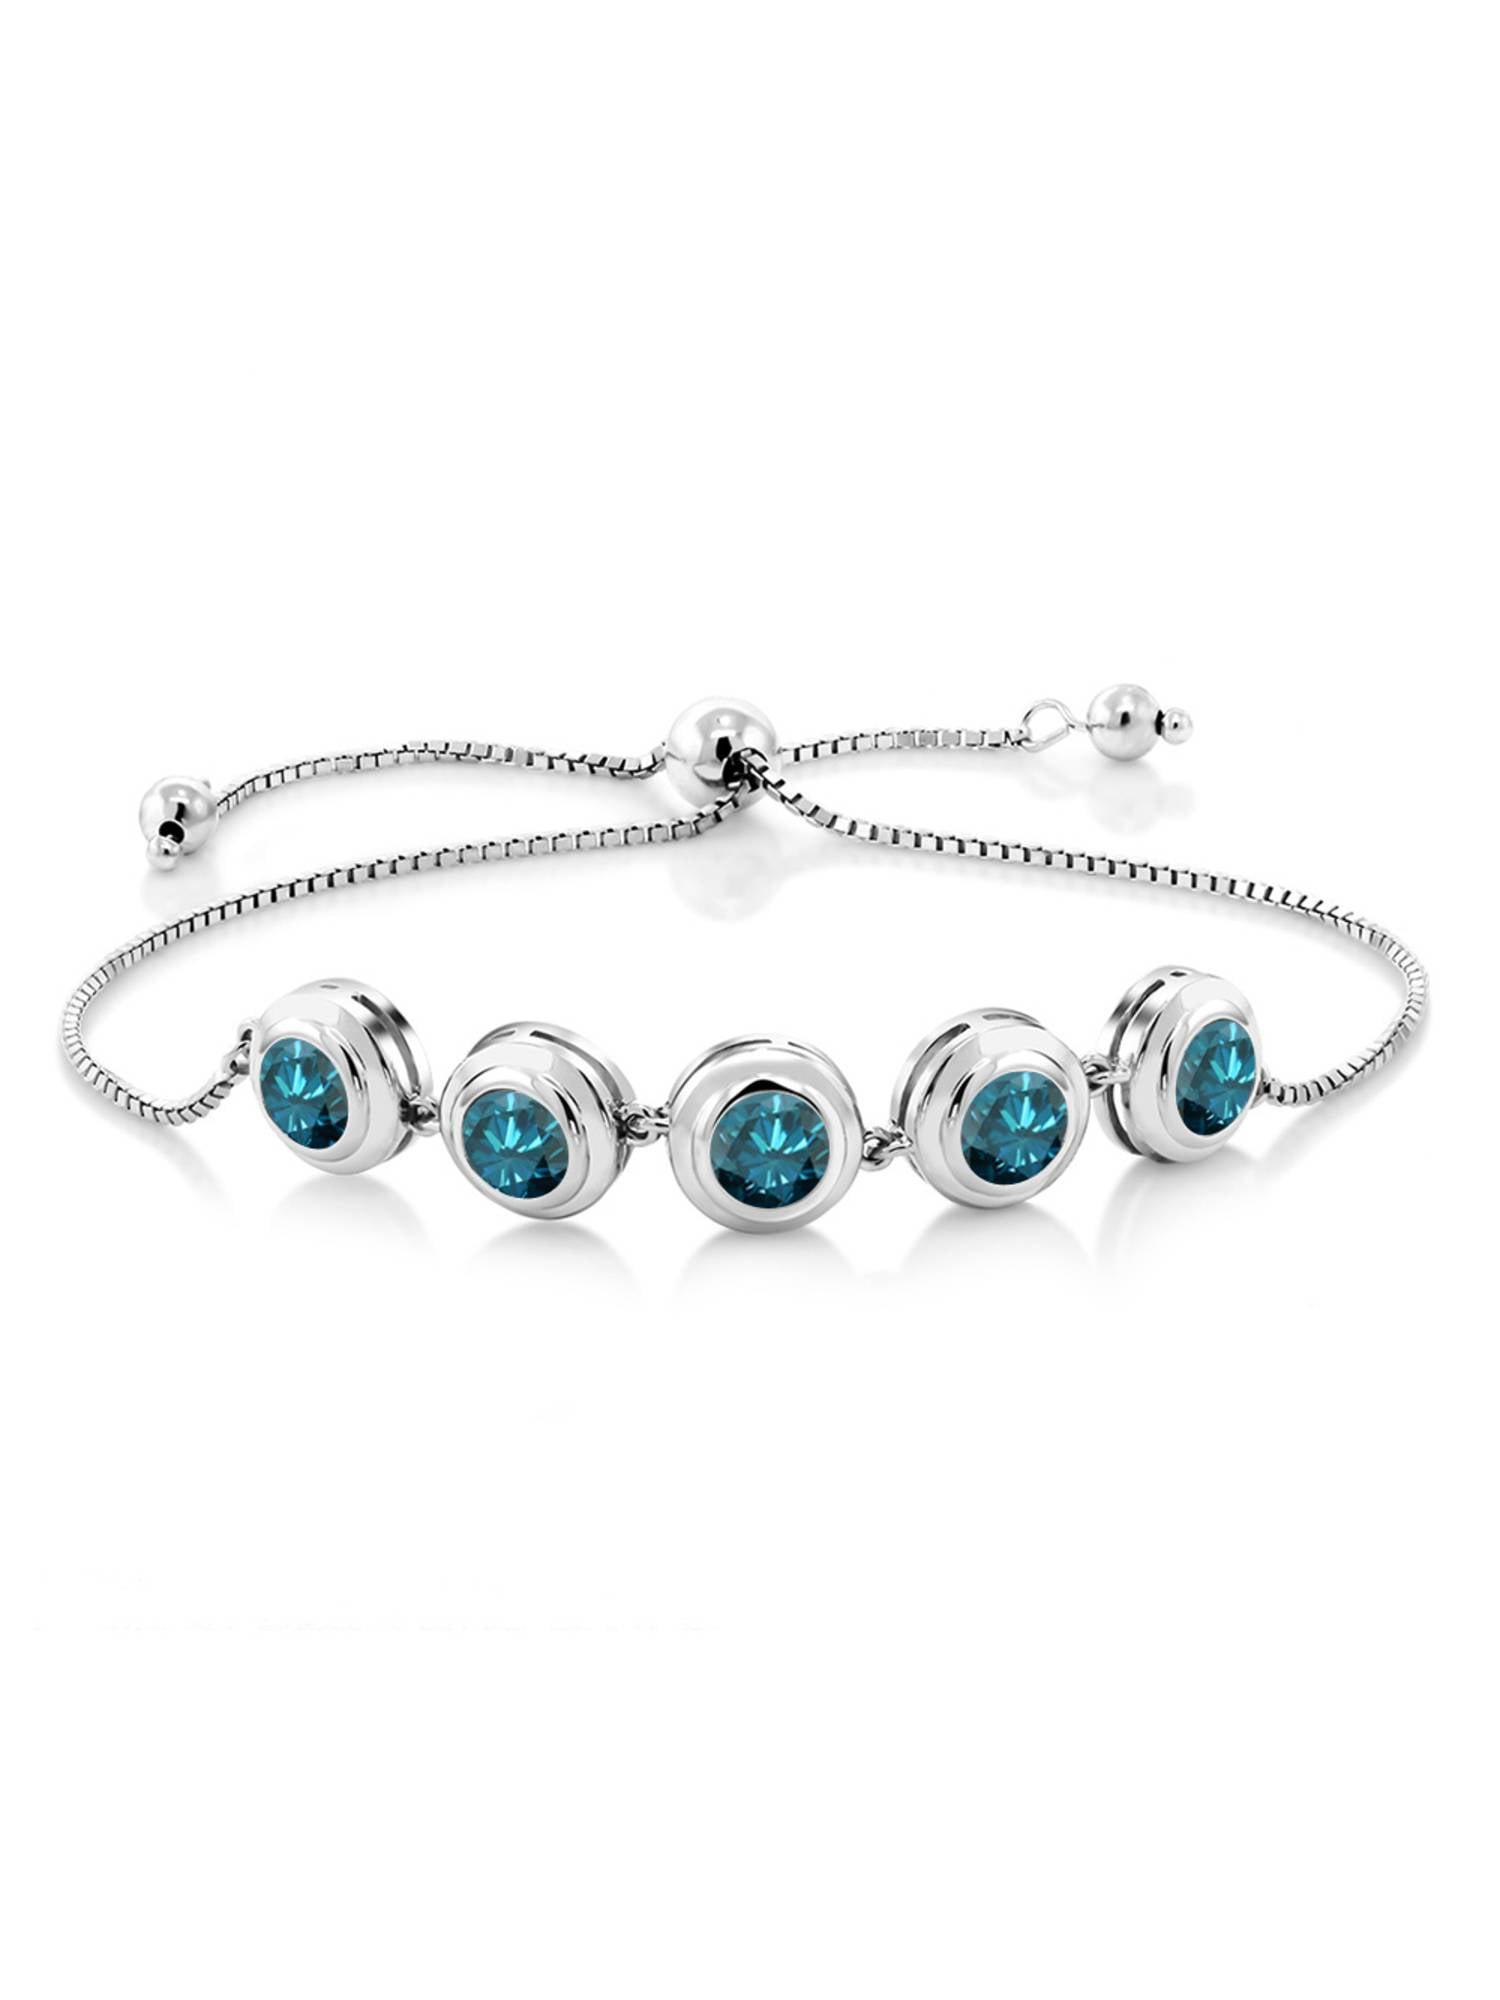 4.00 Ct Round Blue Diamond 925 Sterling Silver Bracelet by